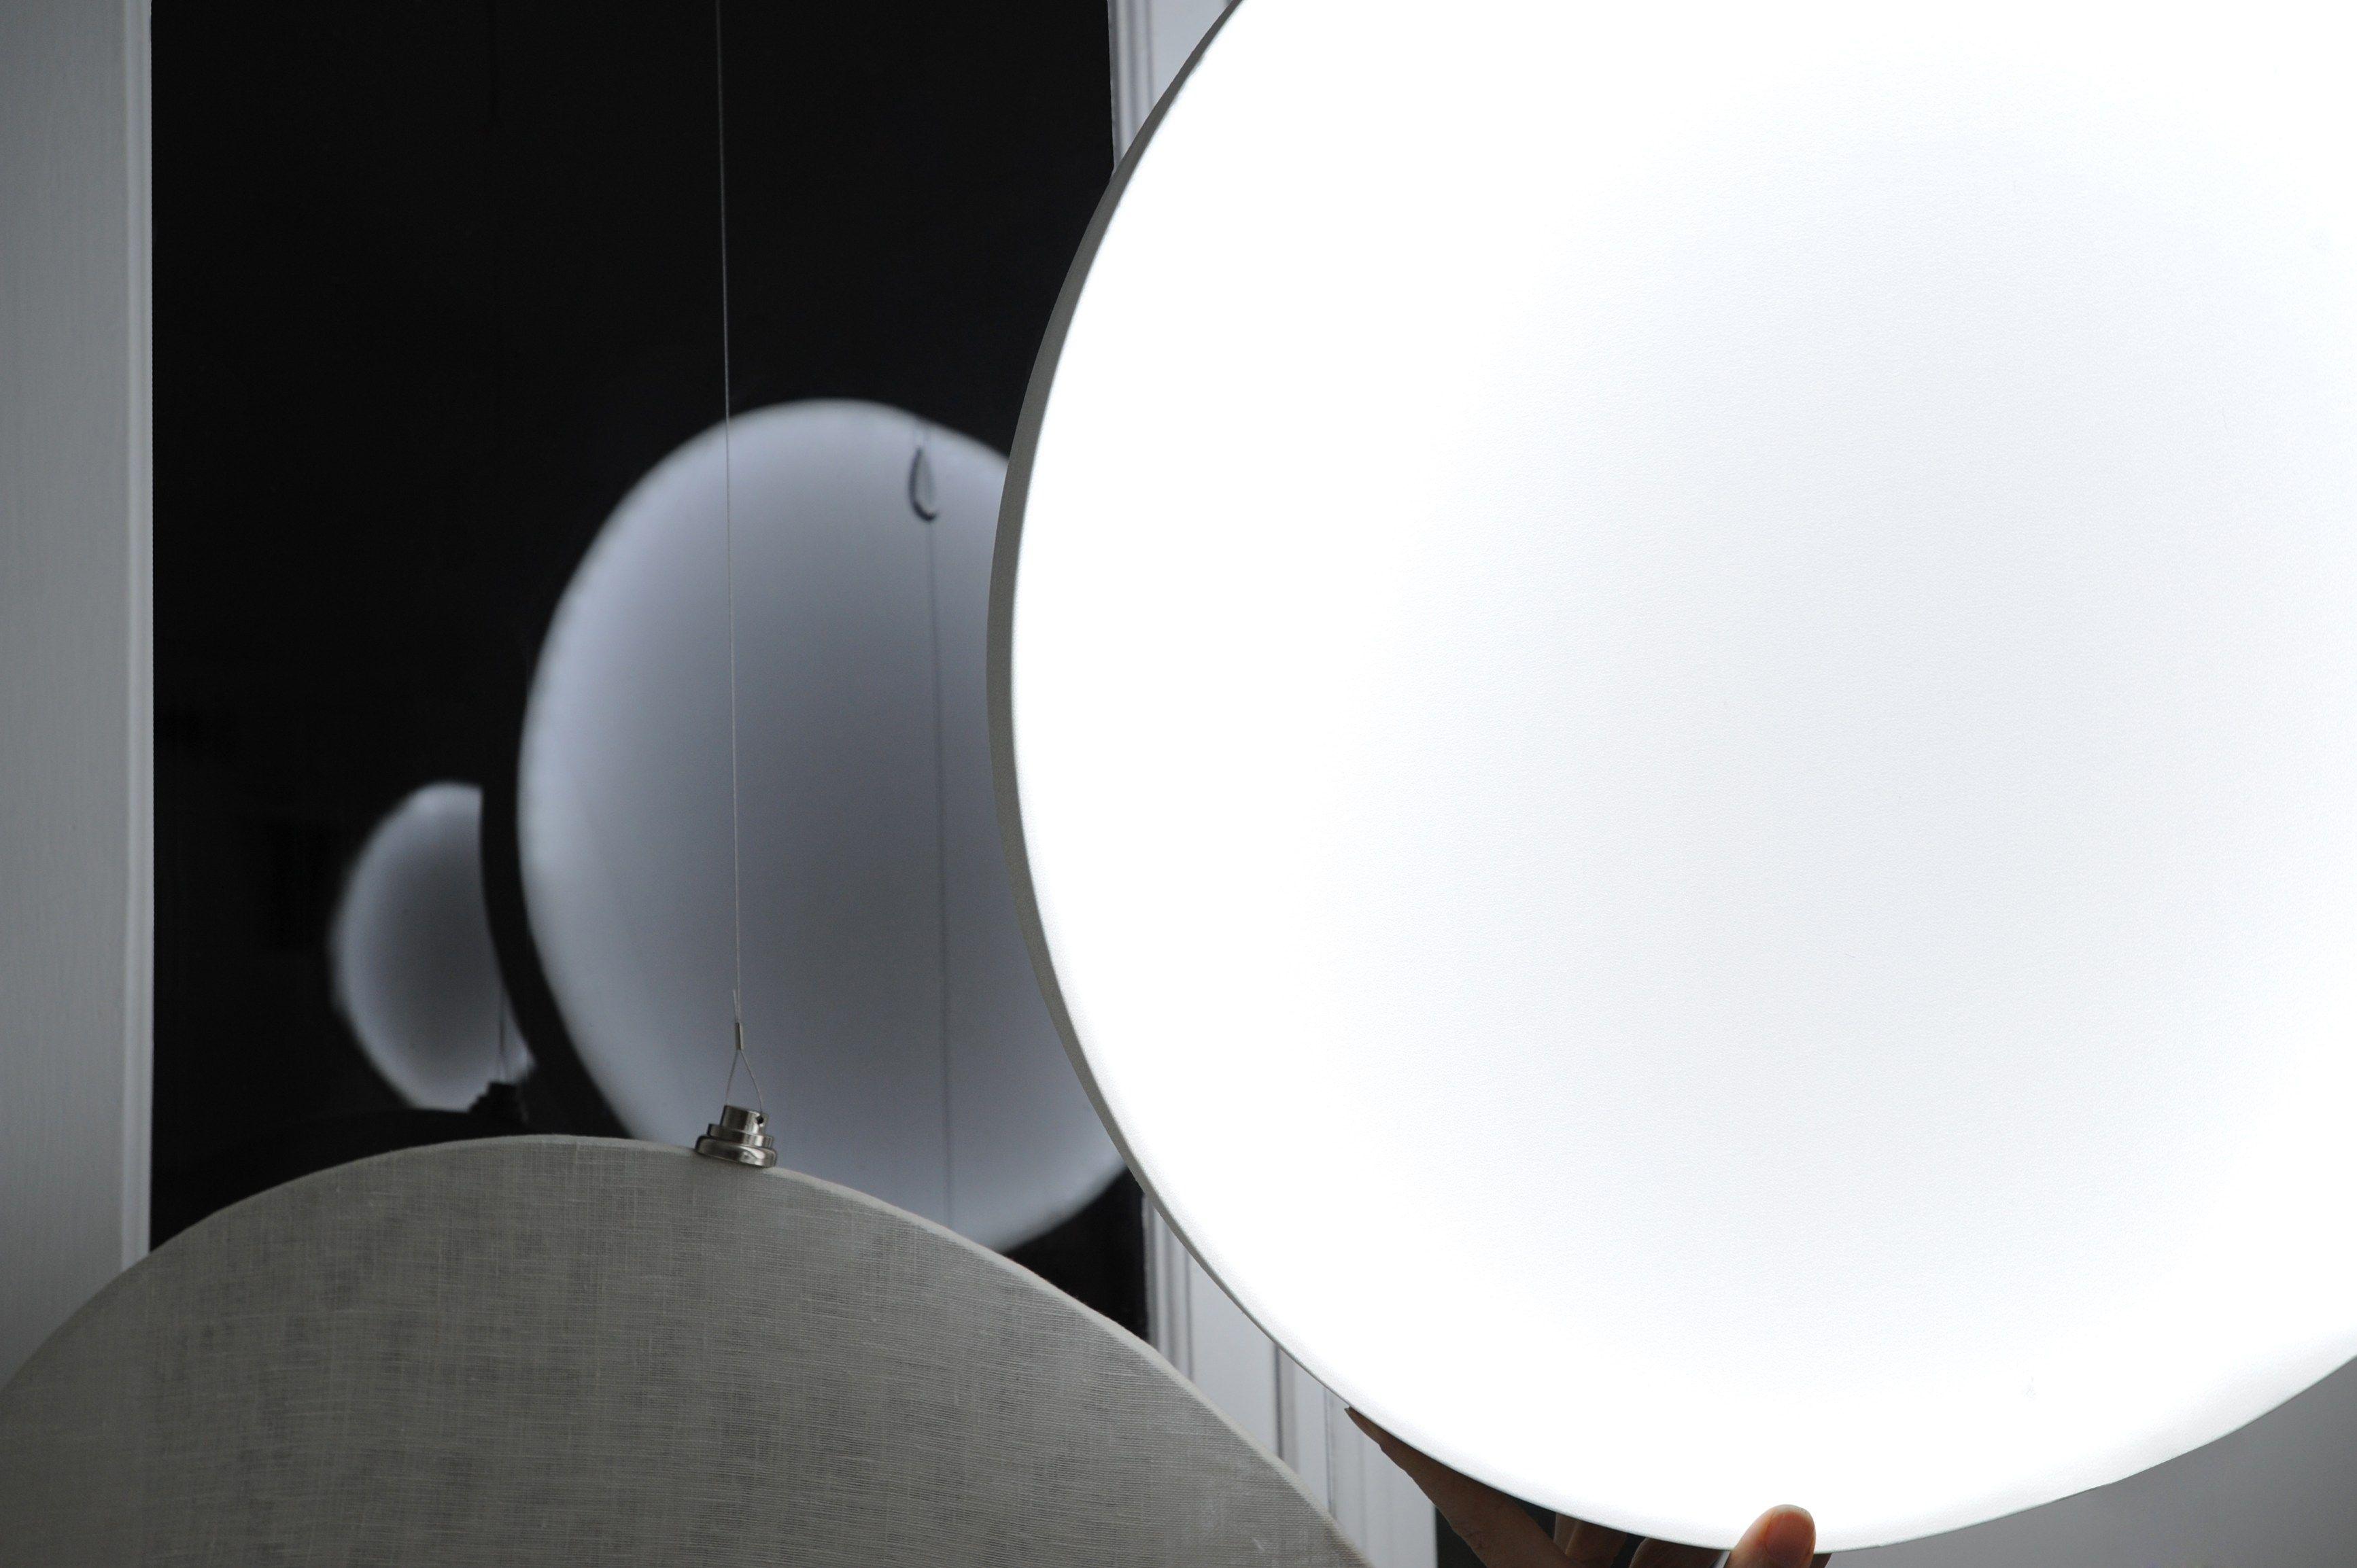 Lampada a sospensione regolabile SHINYSHADOWS by SMARIN design SMARIN